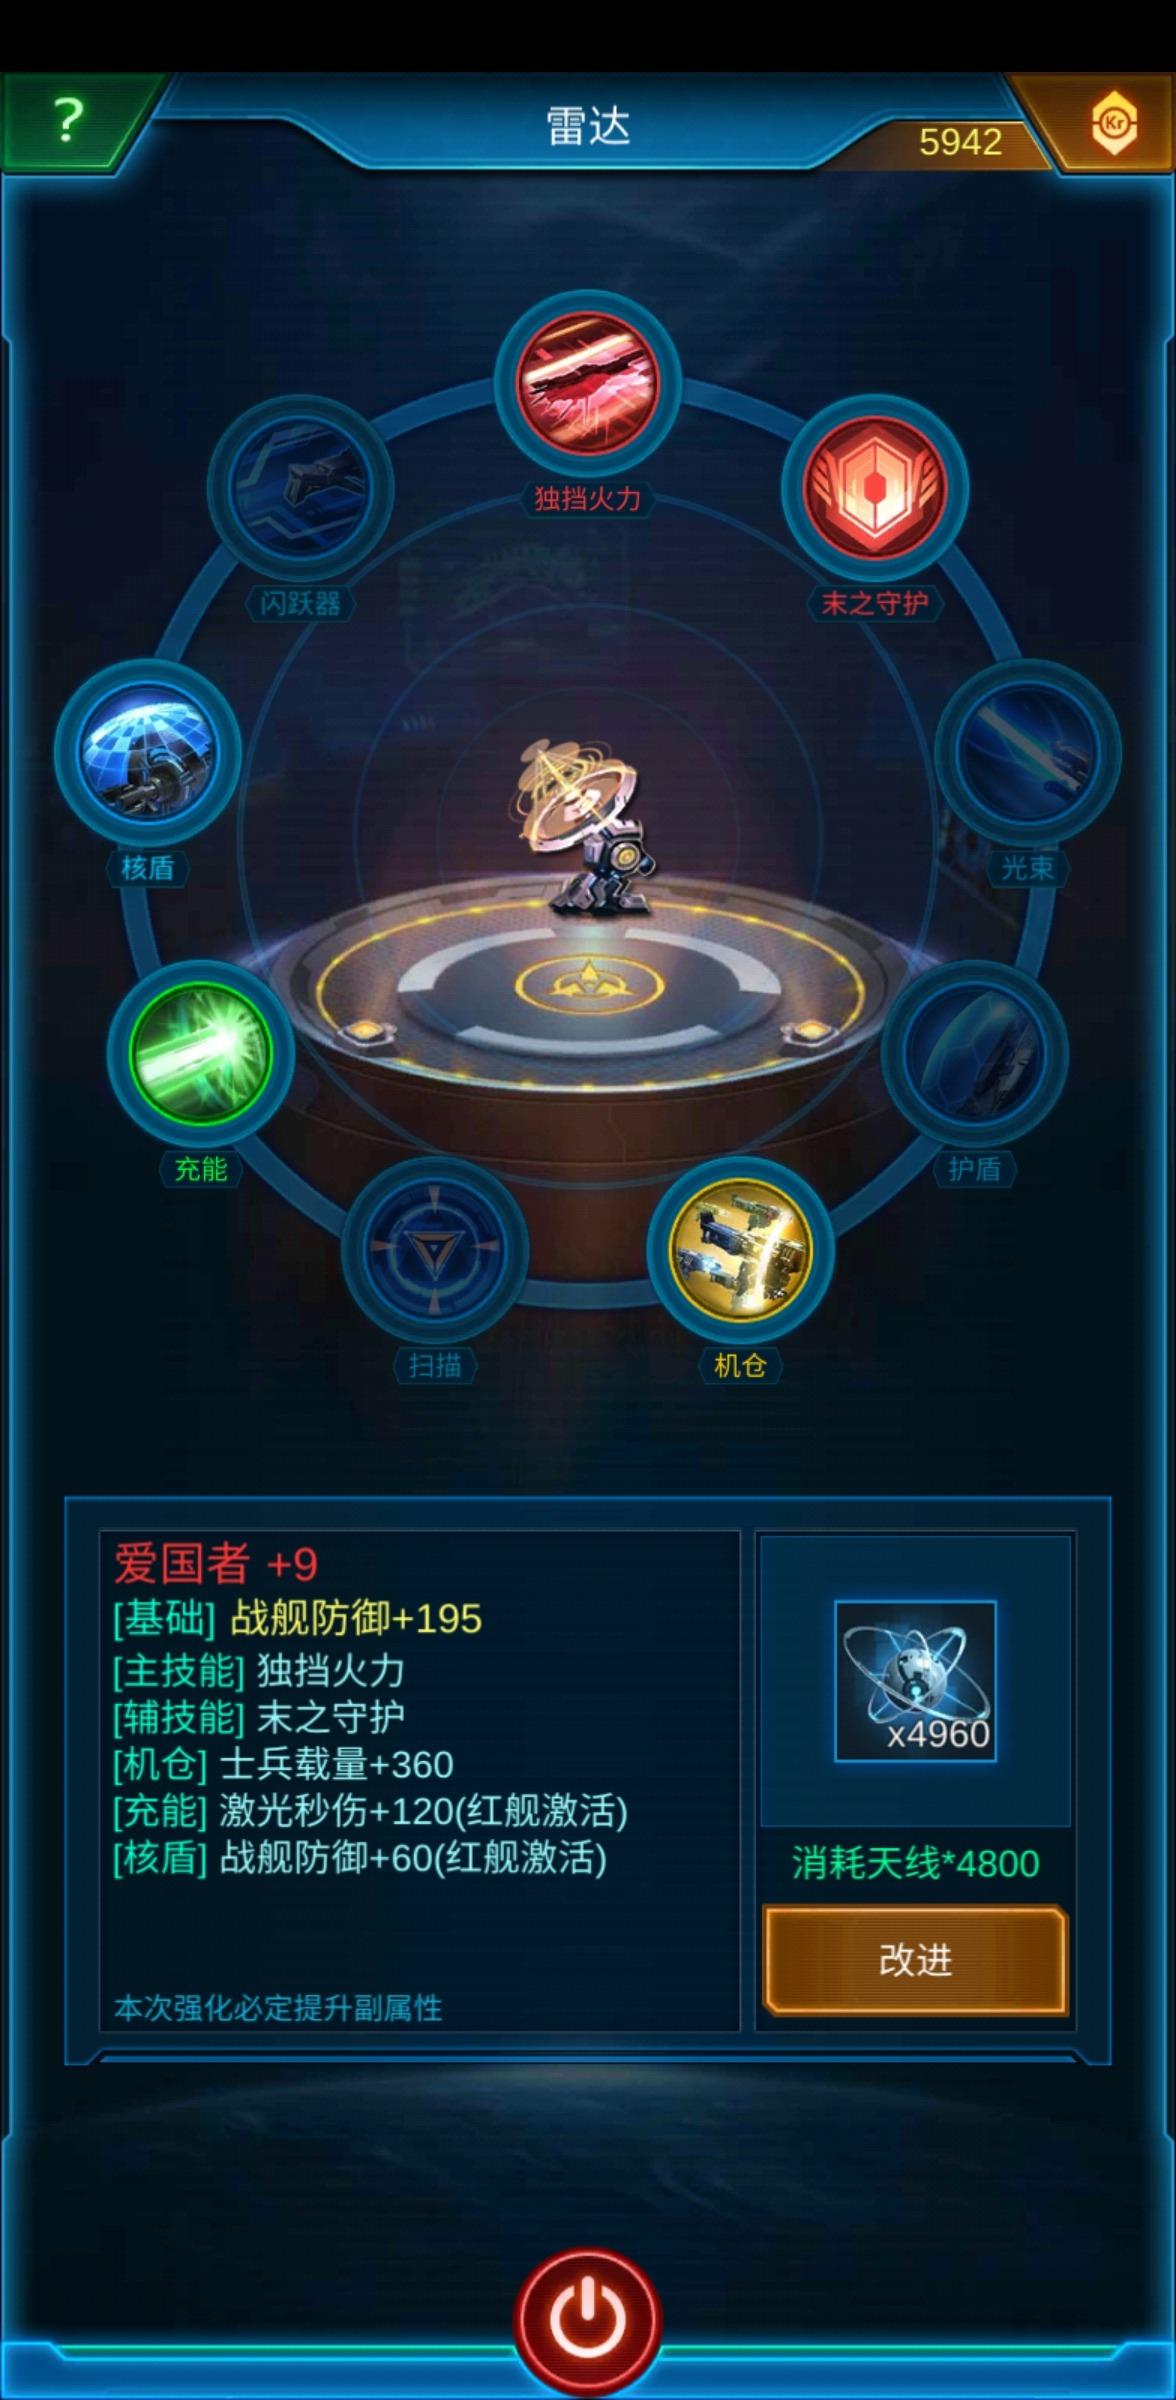 Screenshot_20200318_125859_com.jedigames.p16s.huawei.jpg